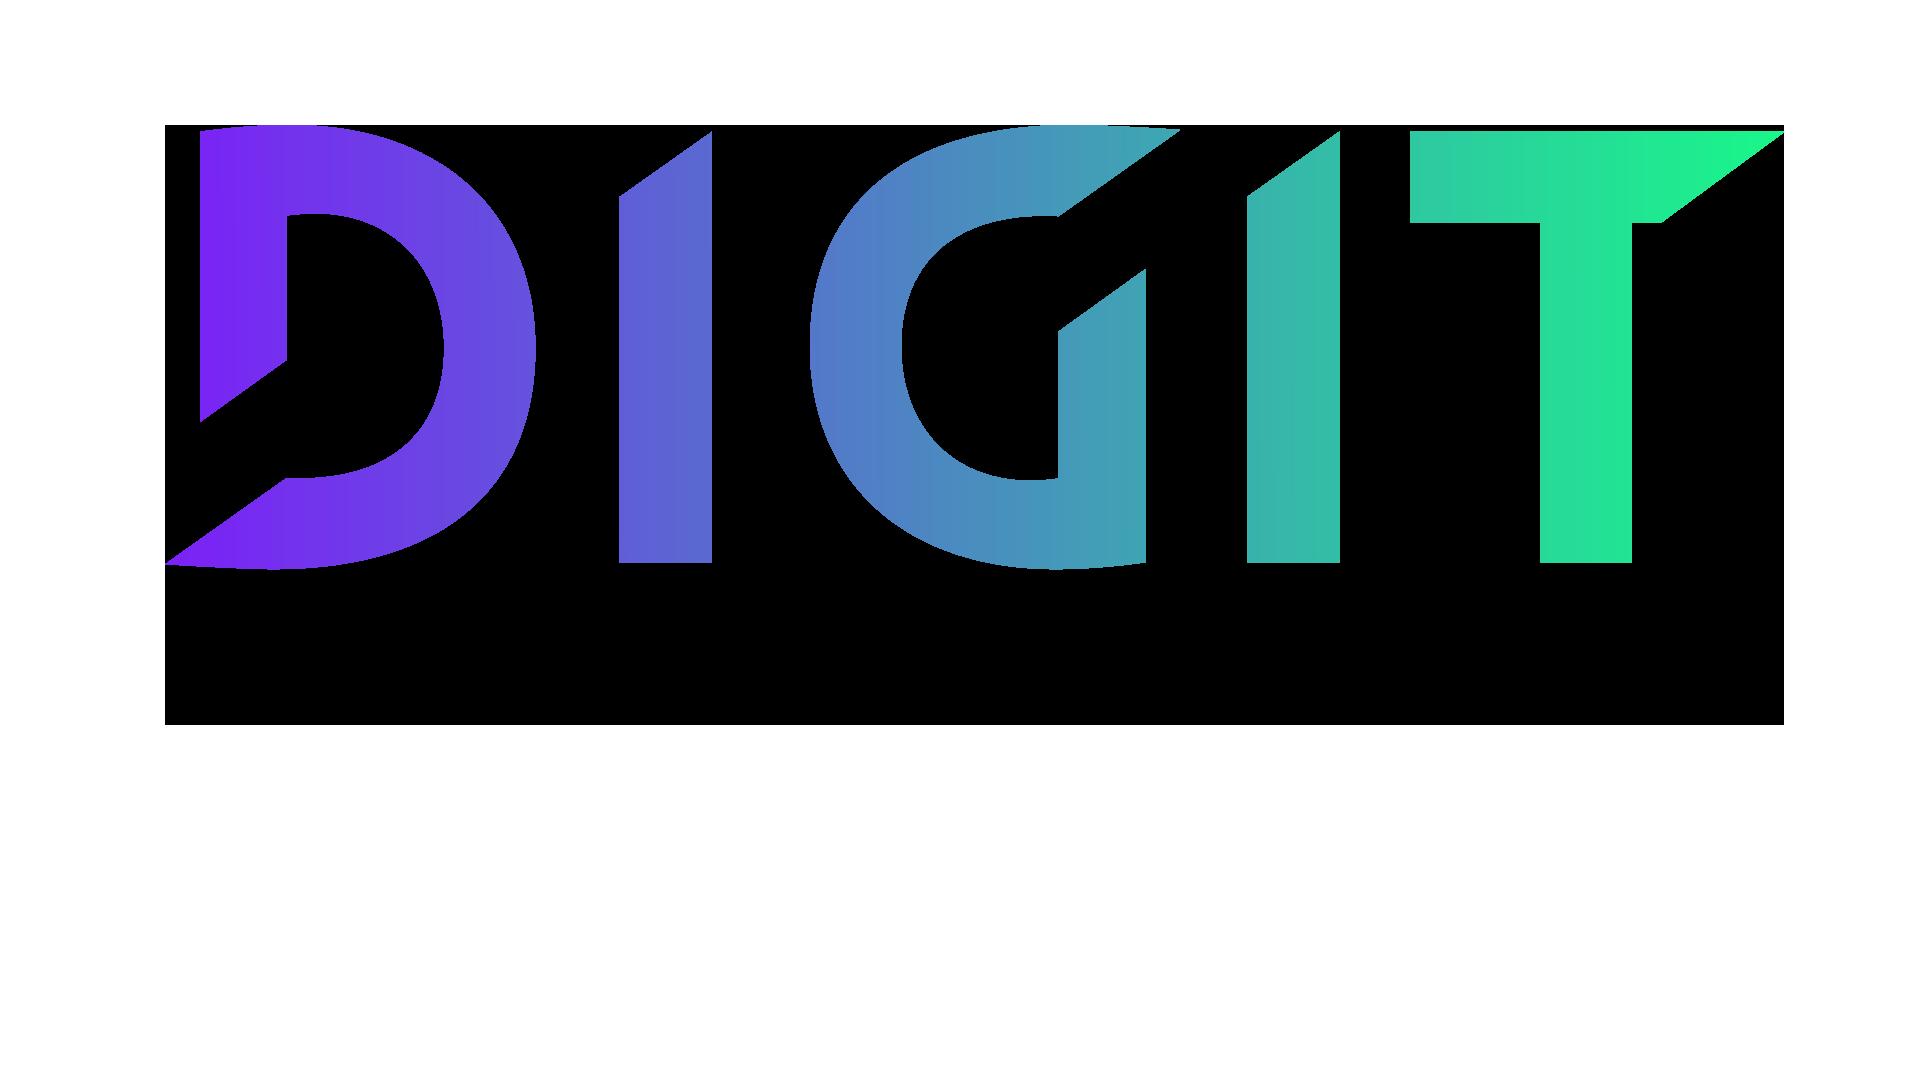 Digit Company